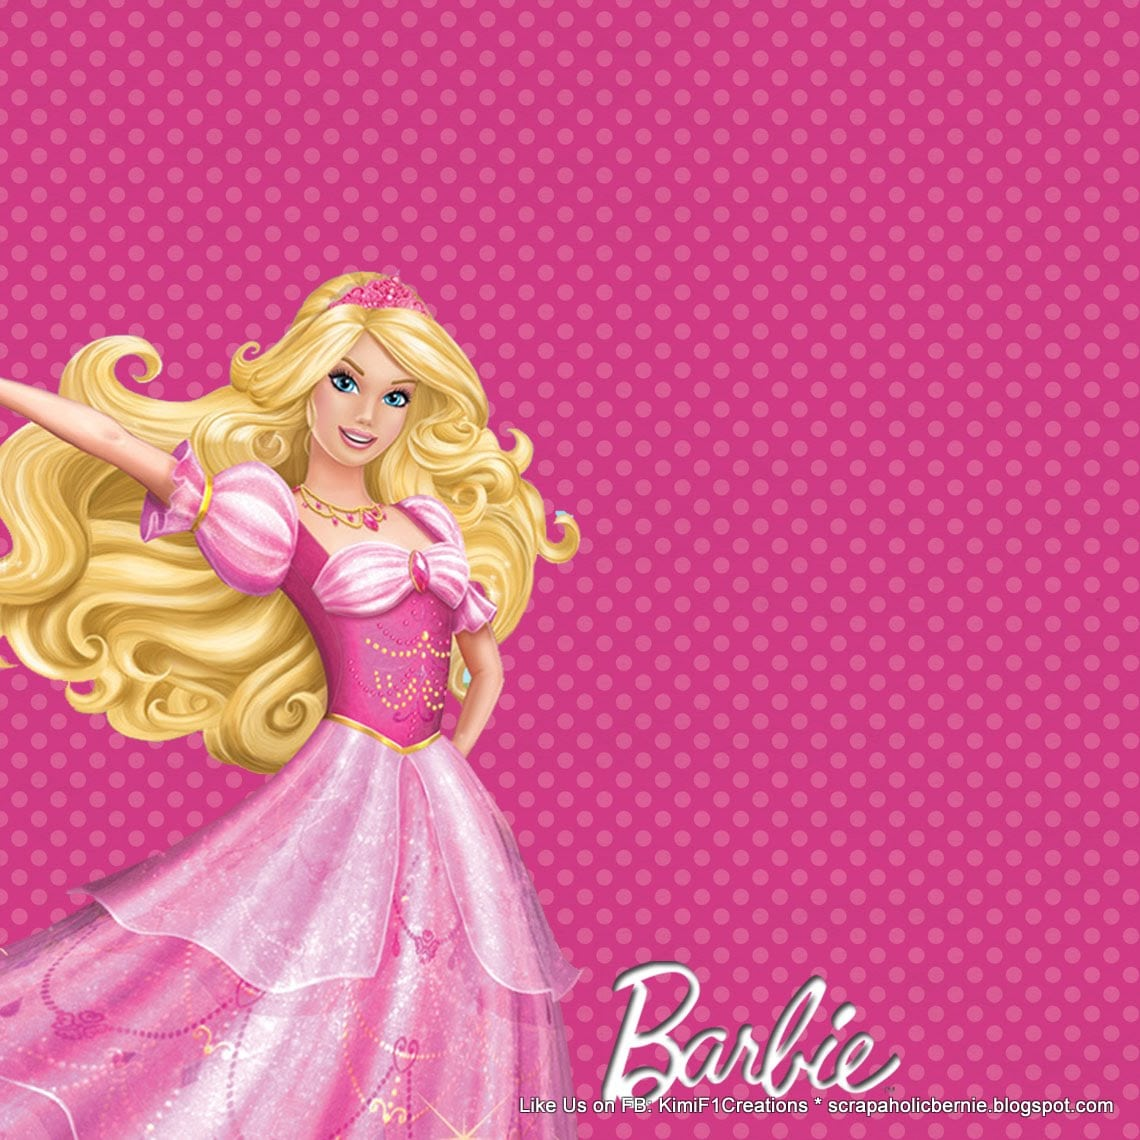 barbie birthday wallpaper - photo #12